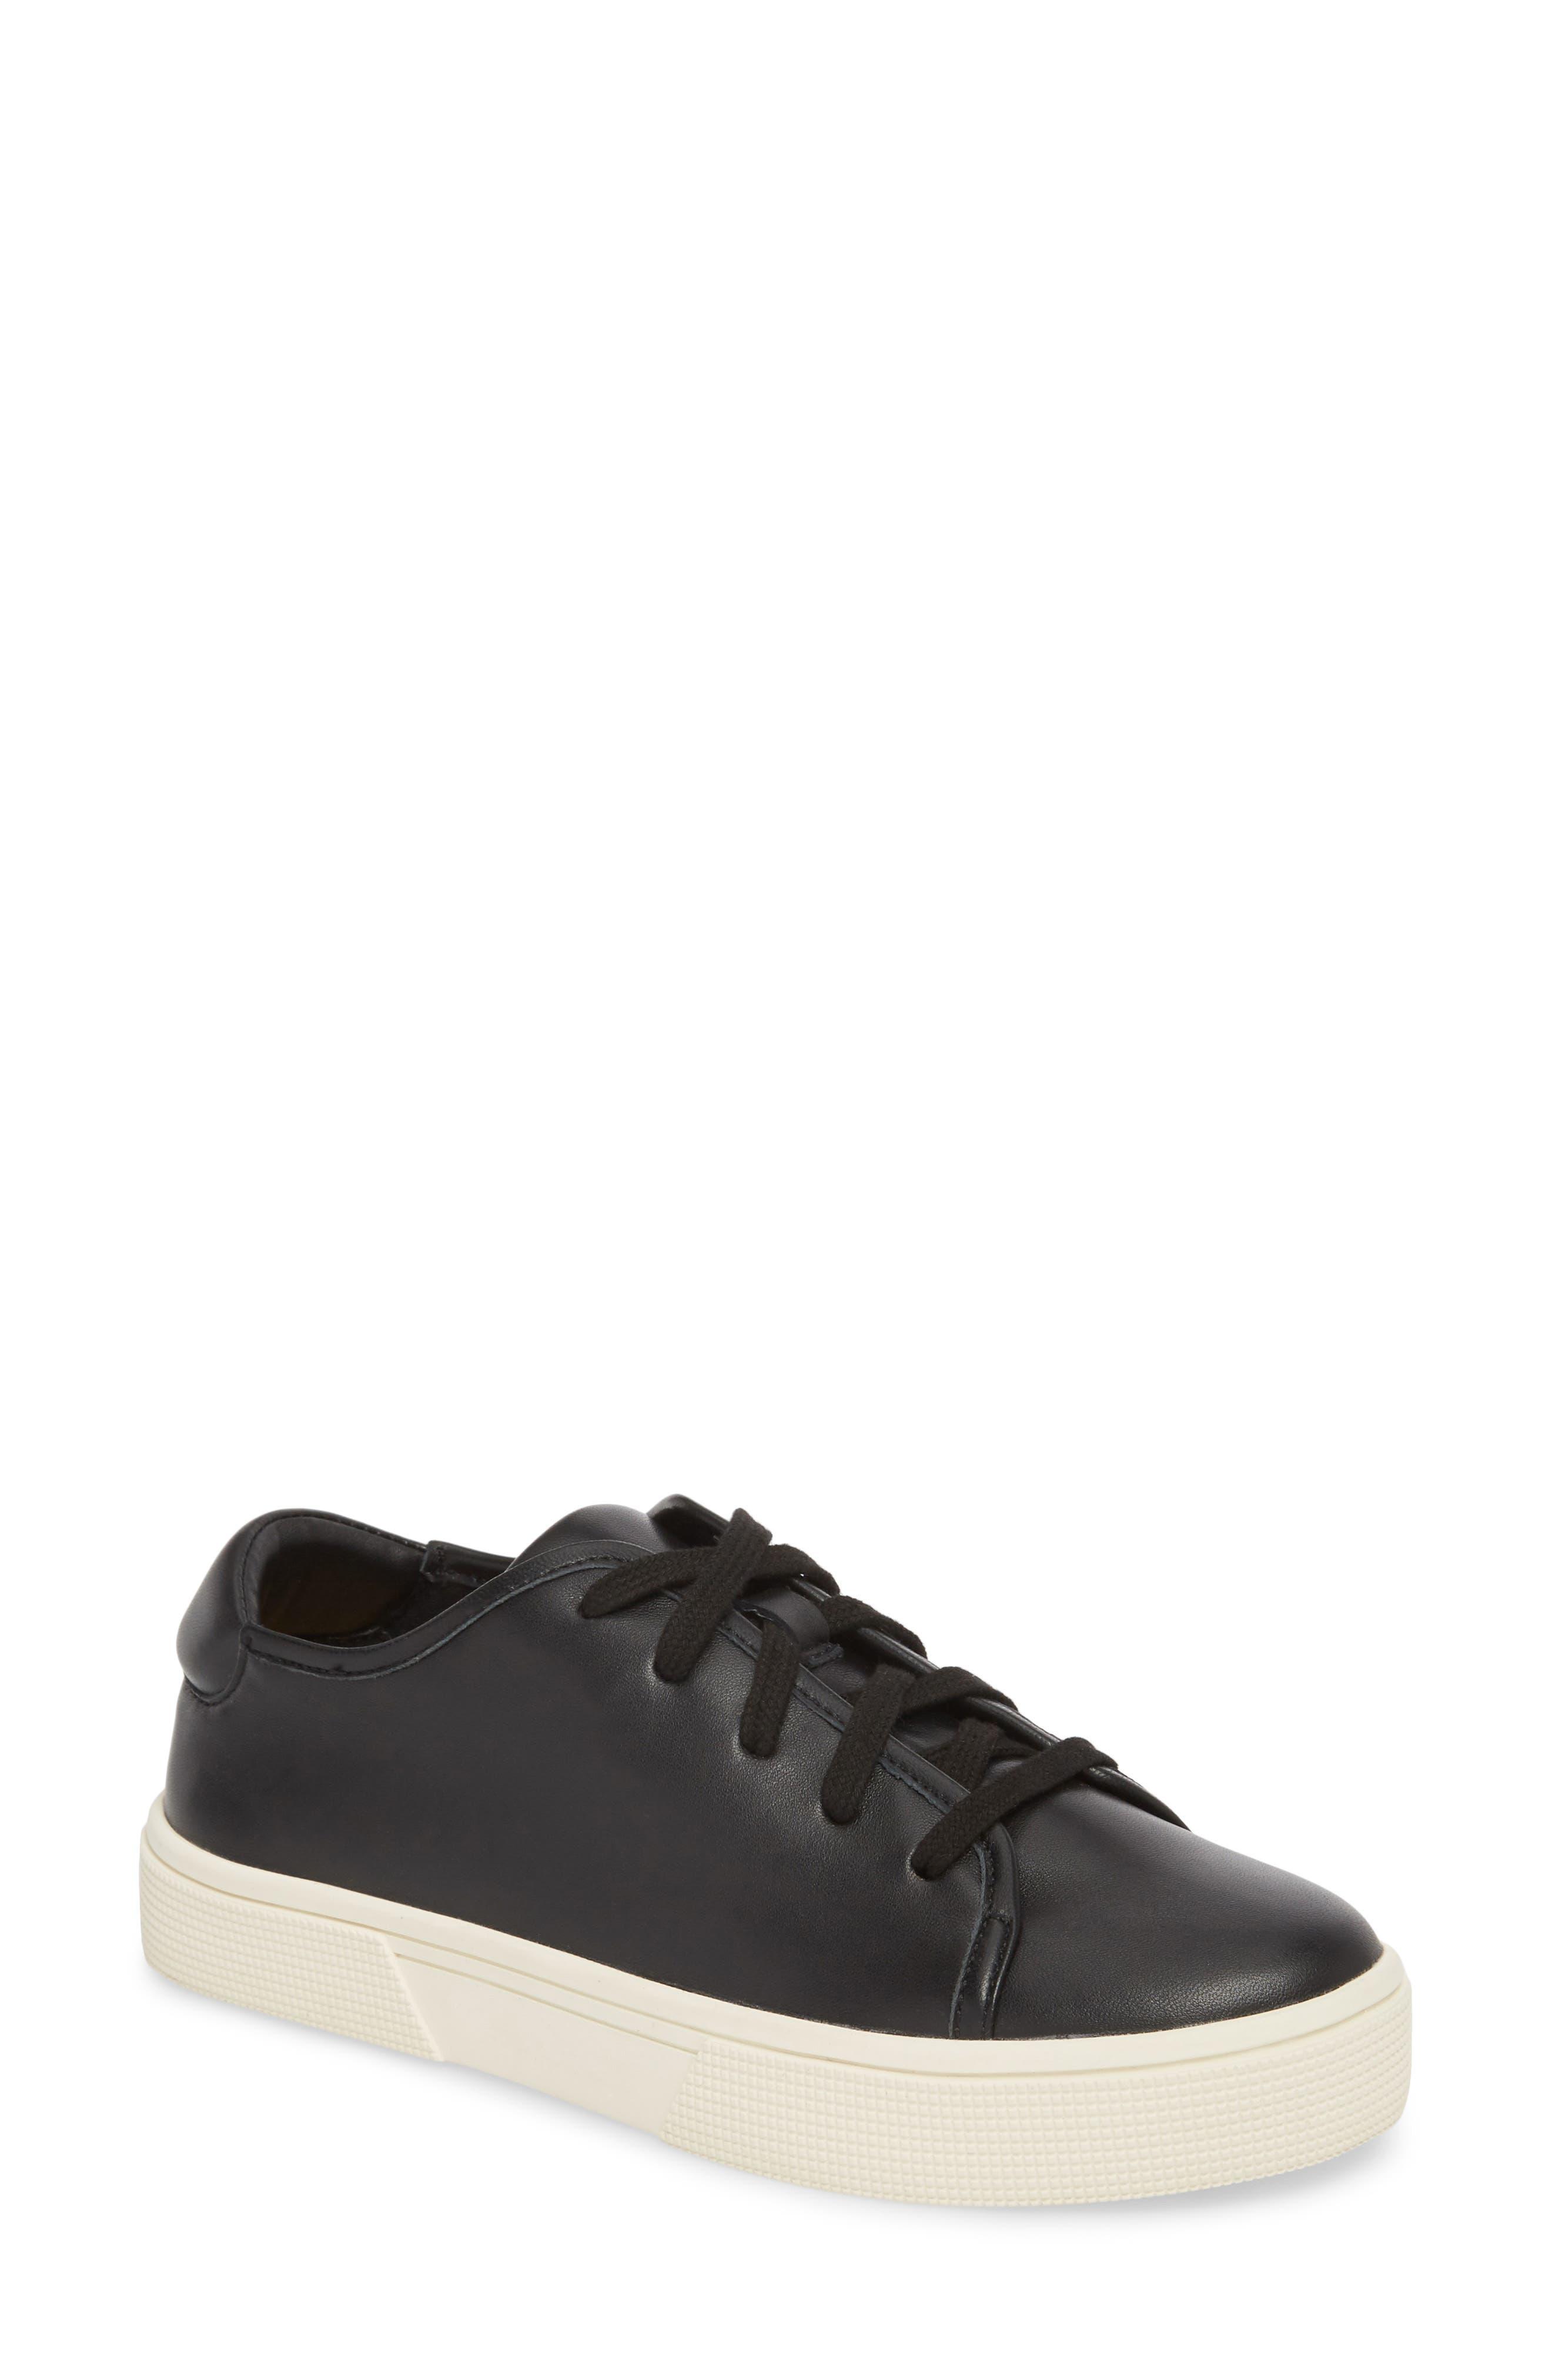 Norvin Sneaker,                             Main thumbnail 1, color,                             BLACK LEATHER